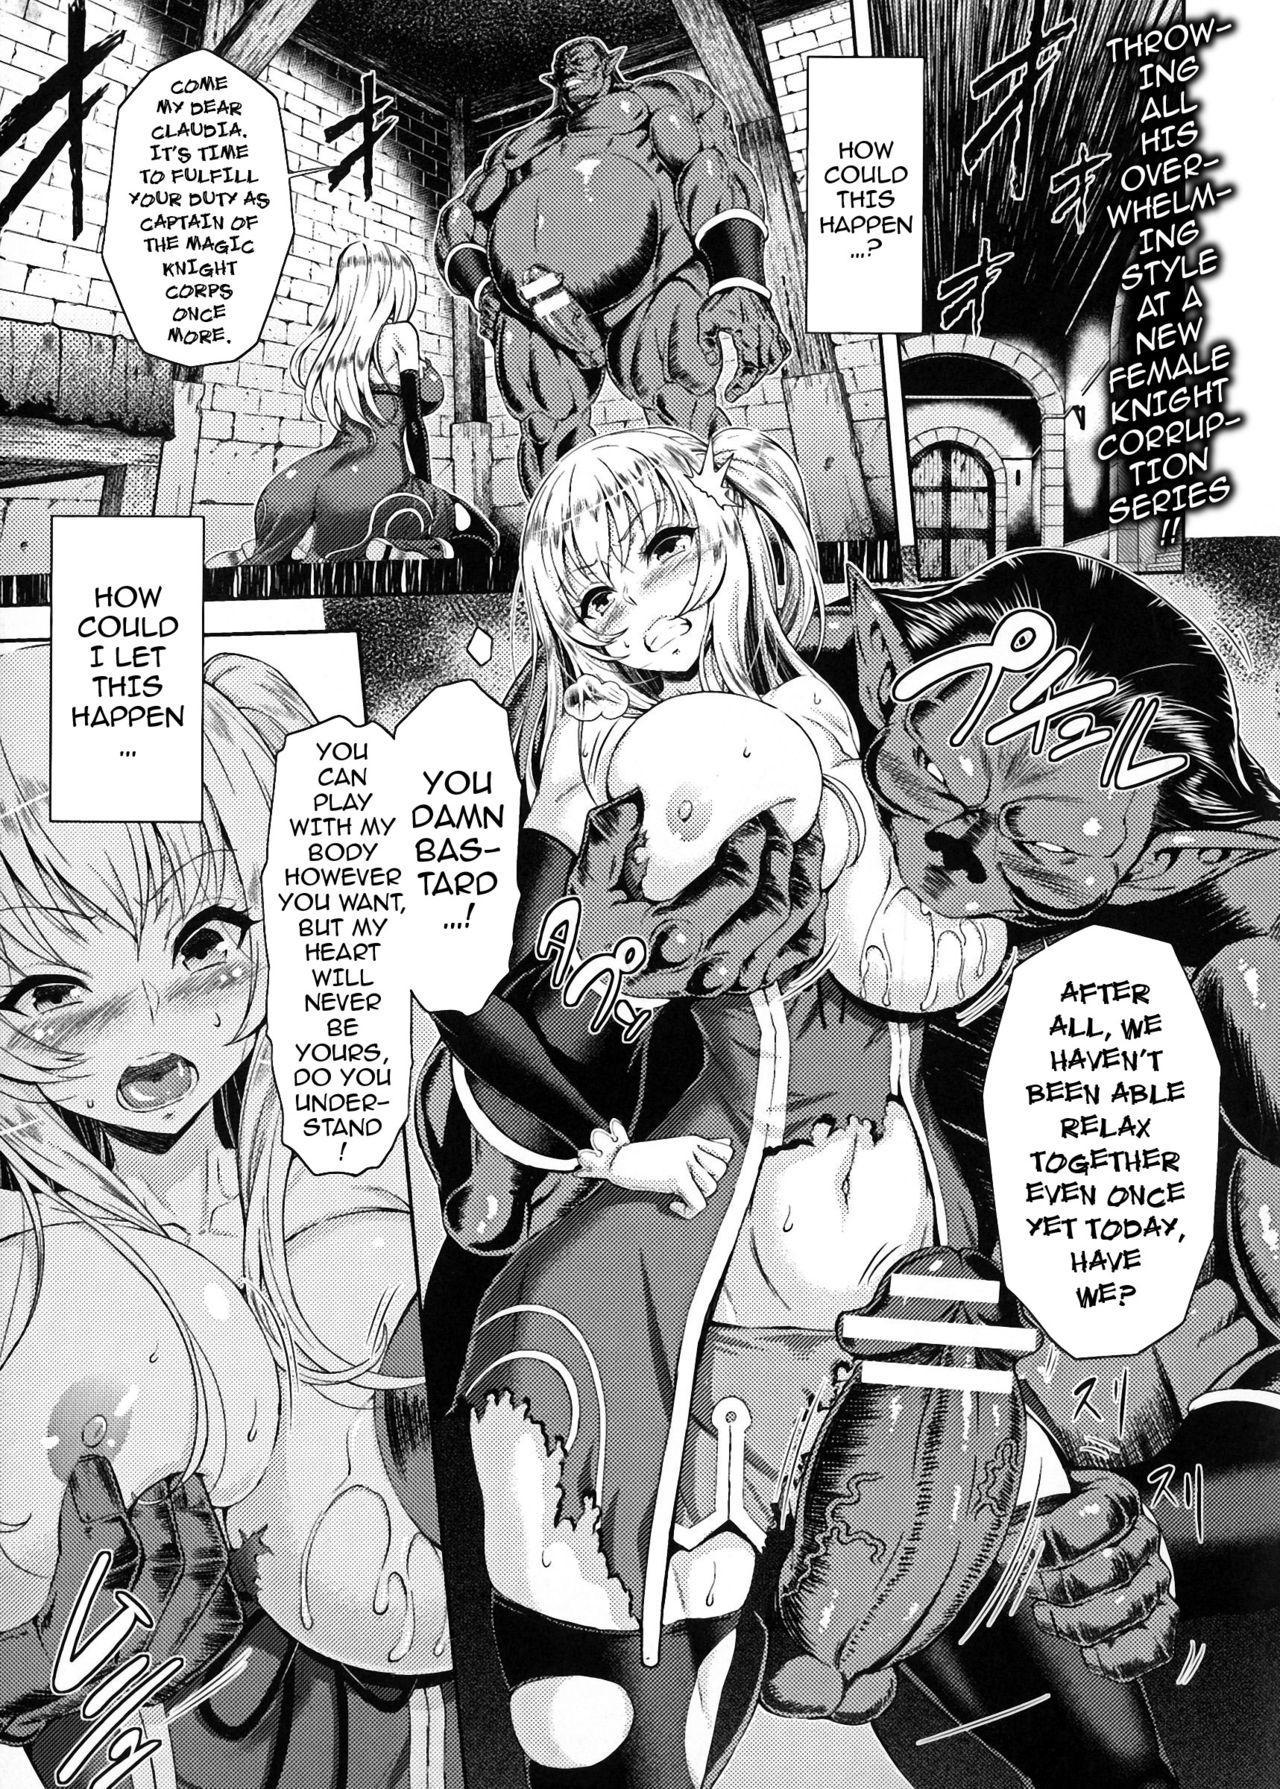 [Yamada Gogogo] ERONA Orc no Inmon ni Okasareta Onna Kishi no Matsuro Ichiwa | ERONA ~The Fall of a Beautiful Knight Cursed with the Lewd Mark of an Orc~ Ch. 1 The Oblivion of Climax (Seigi no Heroine Kangoku File DX Vol. 7) [English] {darknight} 1